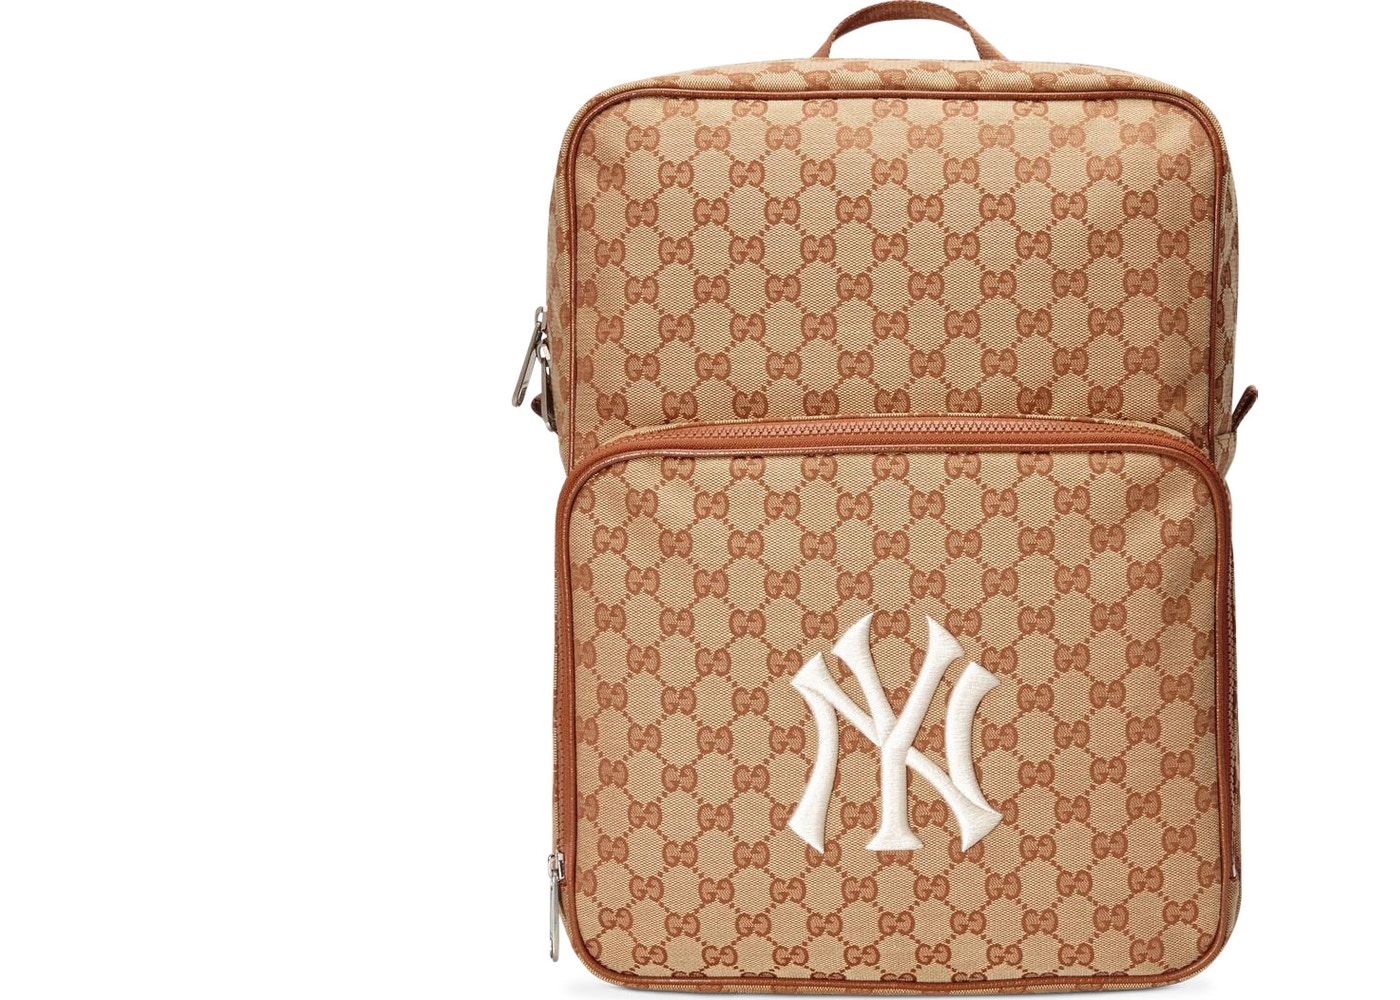 a4f53782f48 Gucci Backpack NY Yankees Medium Brick Red Beige